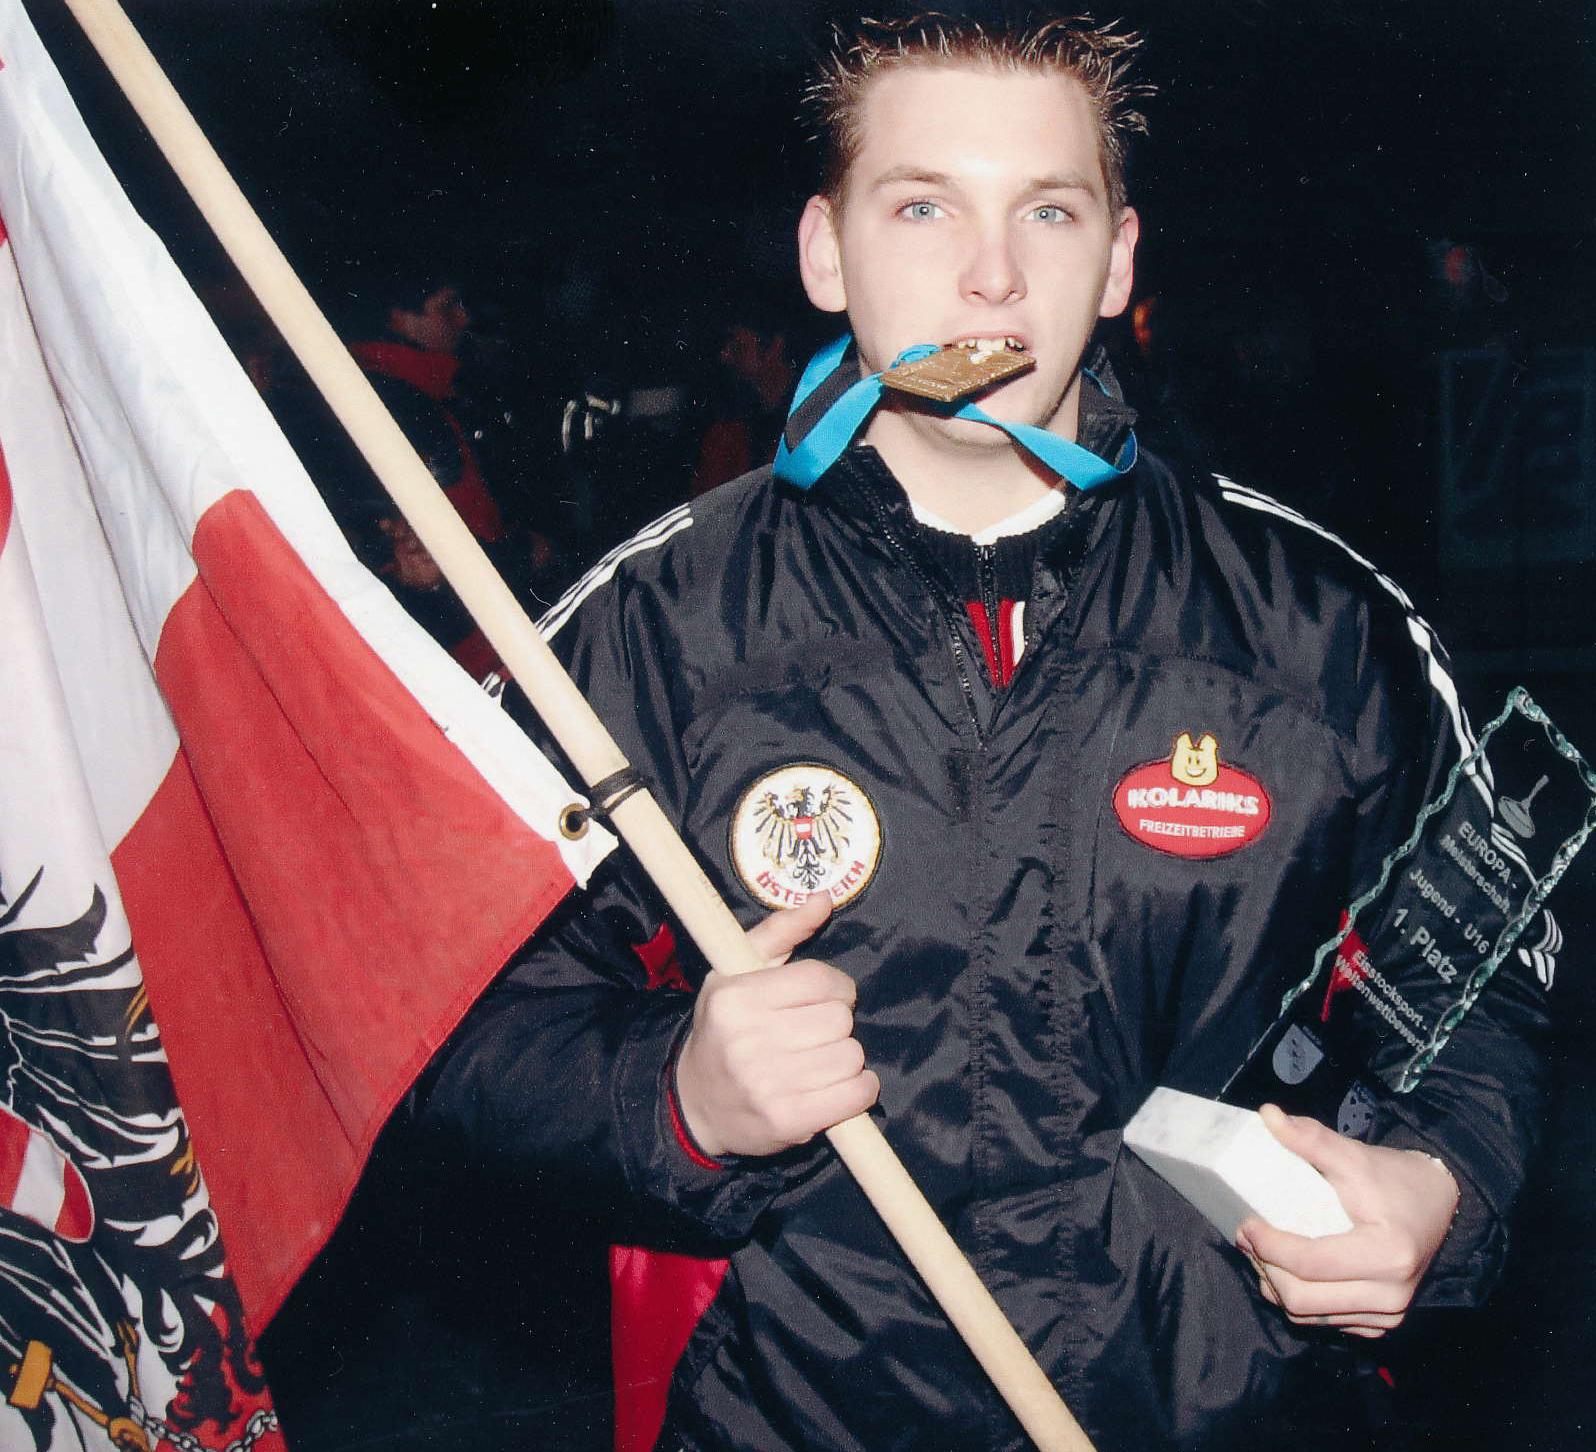 Lukas Pulay Europameister U16 2005